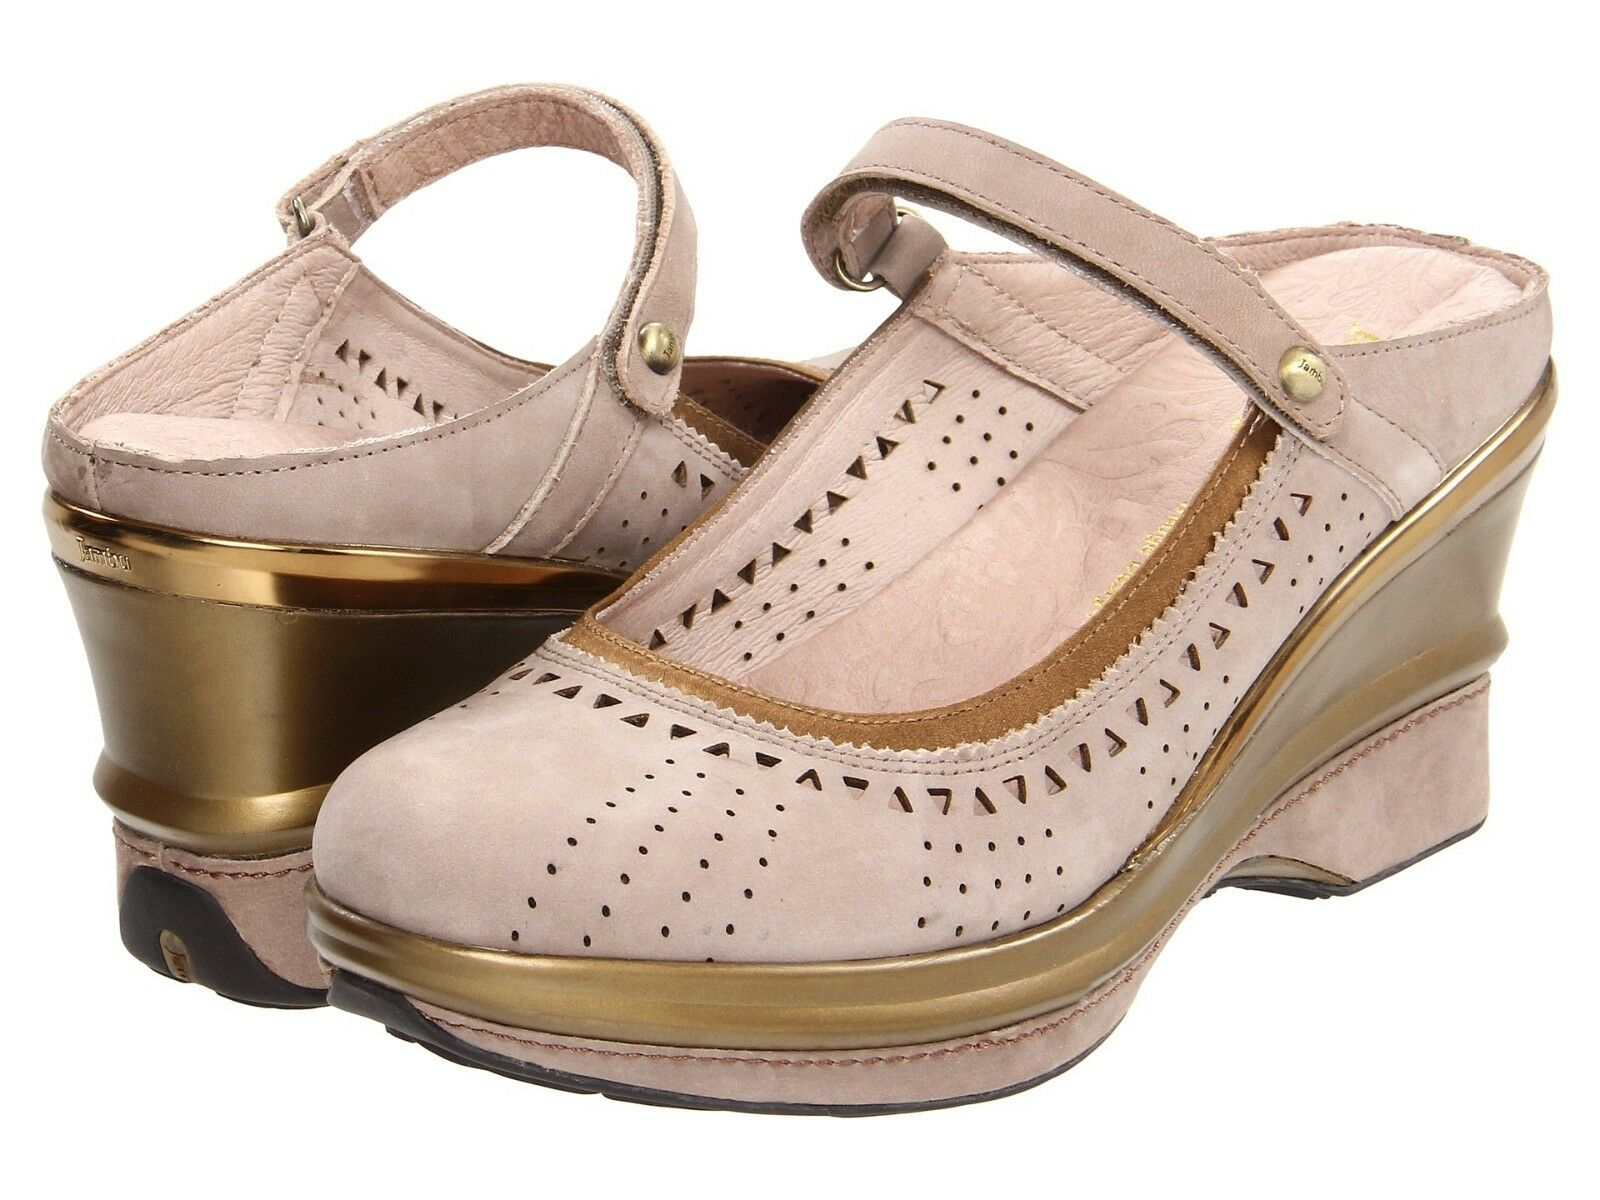 Größe 8.5 JAMBU (Leather) (Leather) (Leather) damen schuhe Reg 150 Limited offer Sale  49.99 71d446